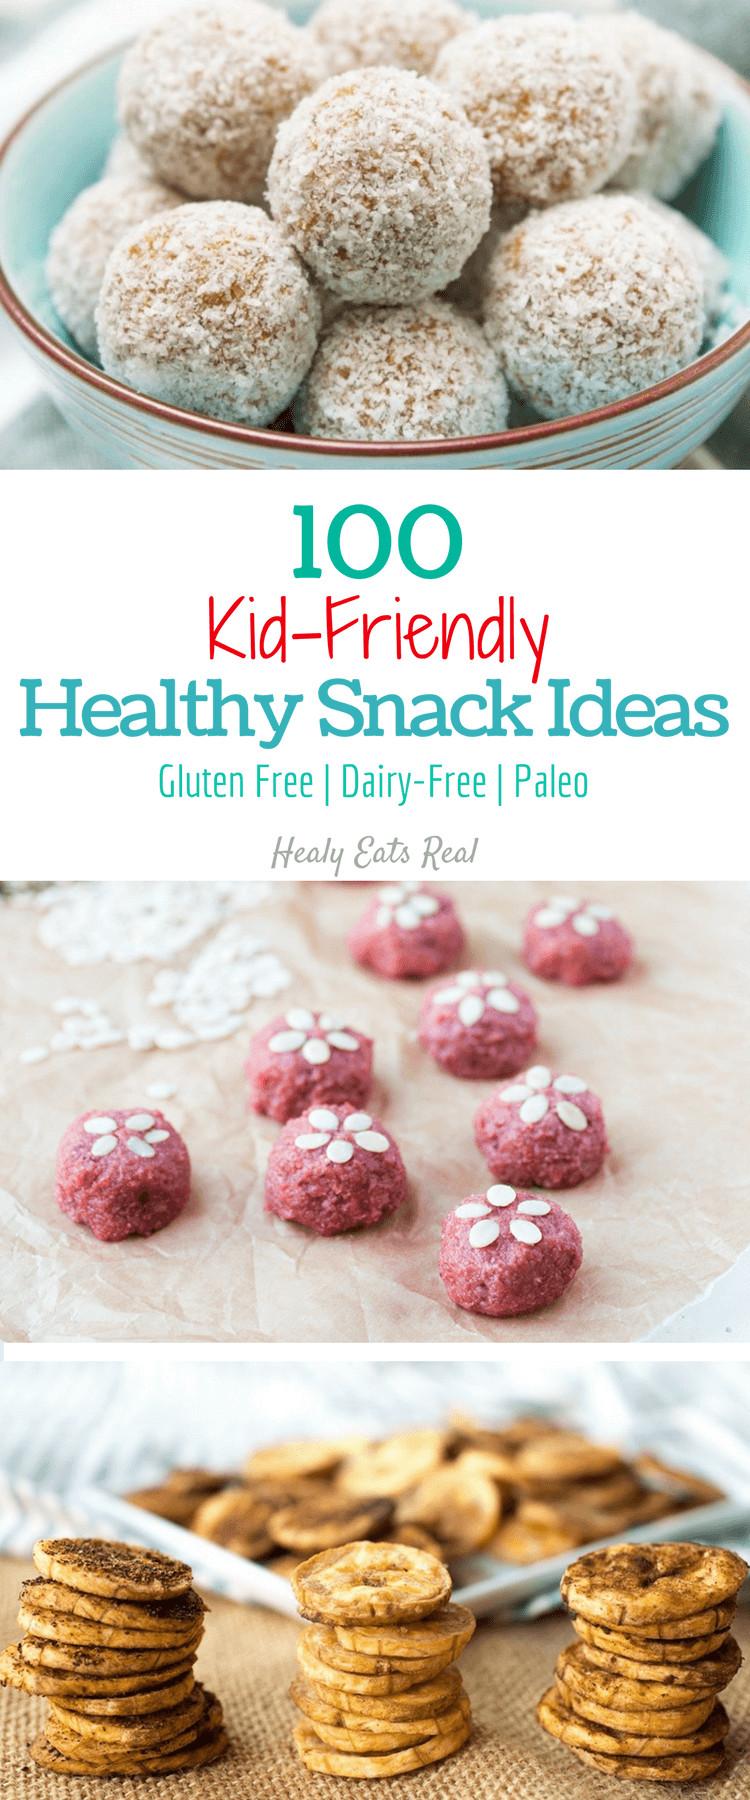 Healthy Kid Friendly Snacks  100 Kid Friendly Healthy Snack Ideas Gluten Free Dairy